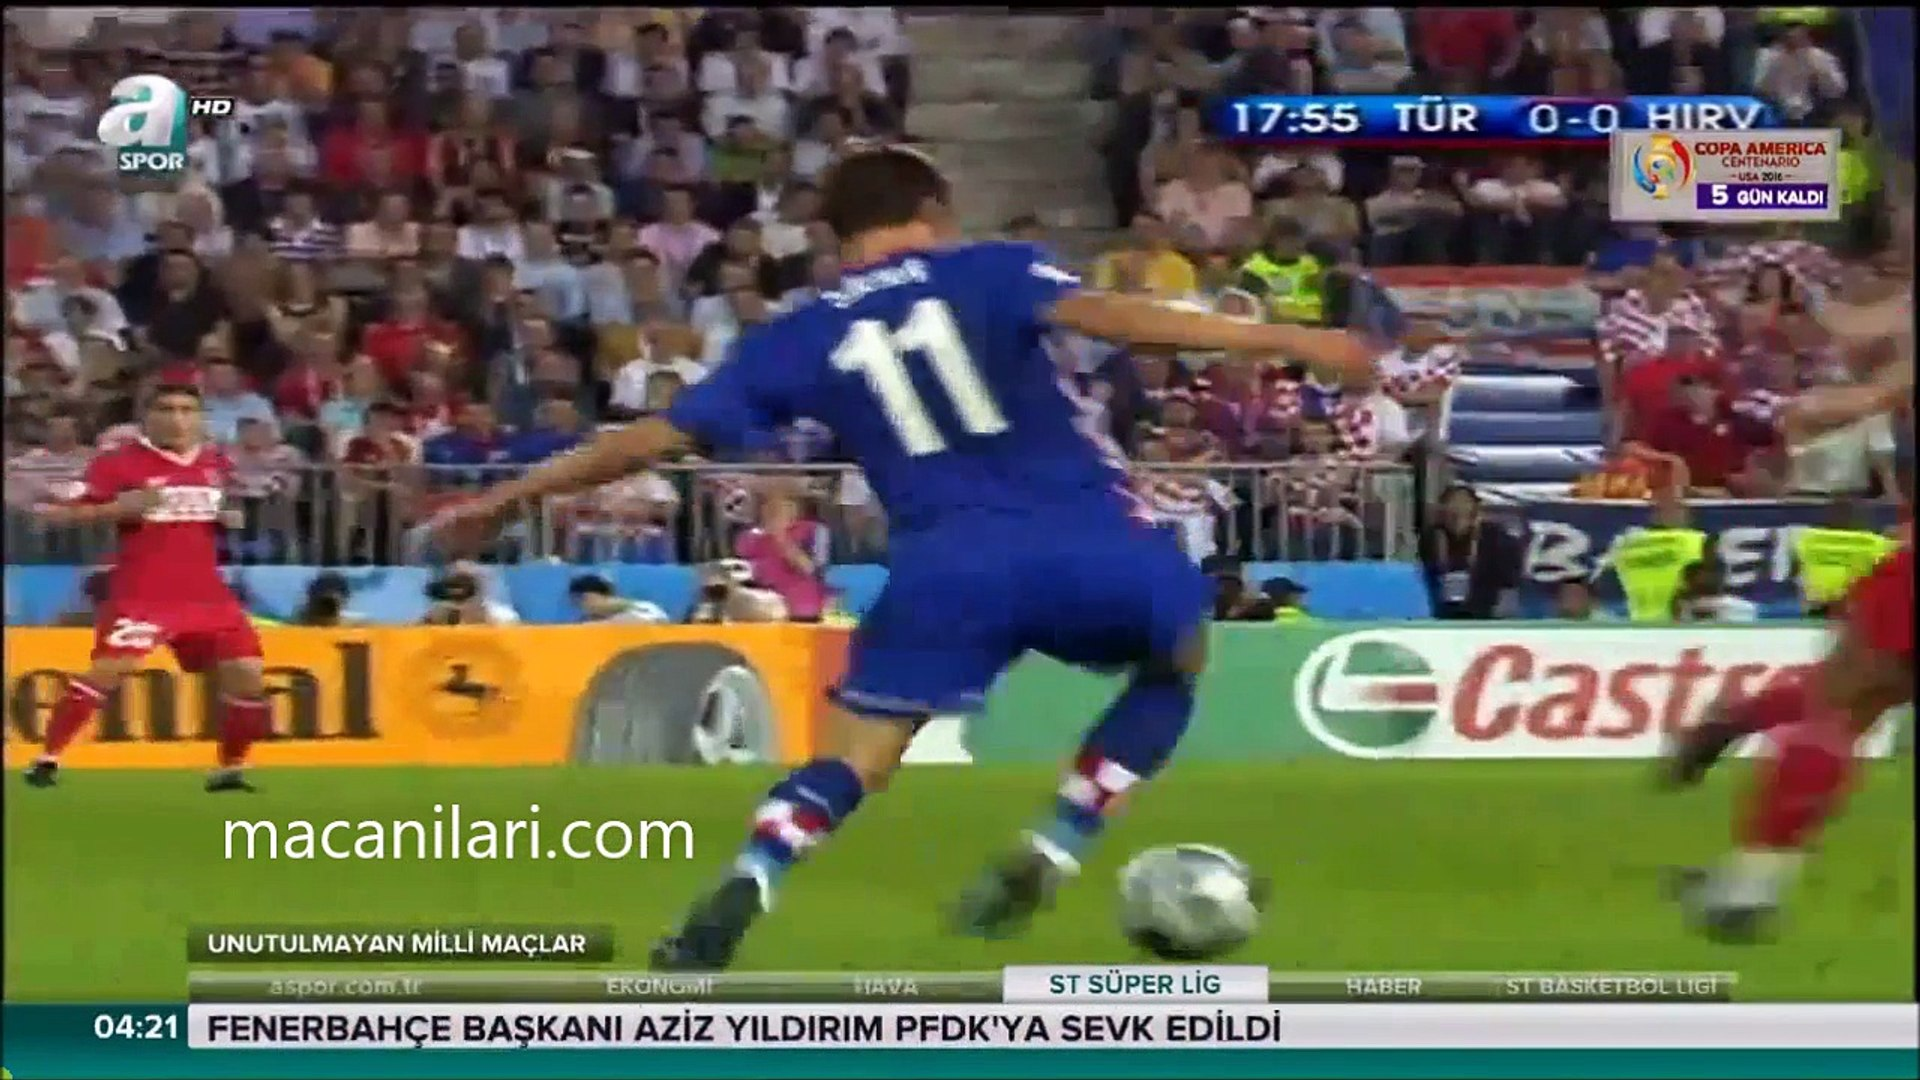 [HD] 20.06.2008 - UEFA EURO 2008 Quarter Final Croatia 1-1 Turkey (With Pen. 1-3) - Avrupa Futbol Şa